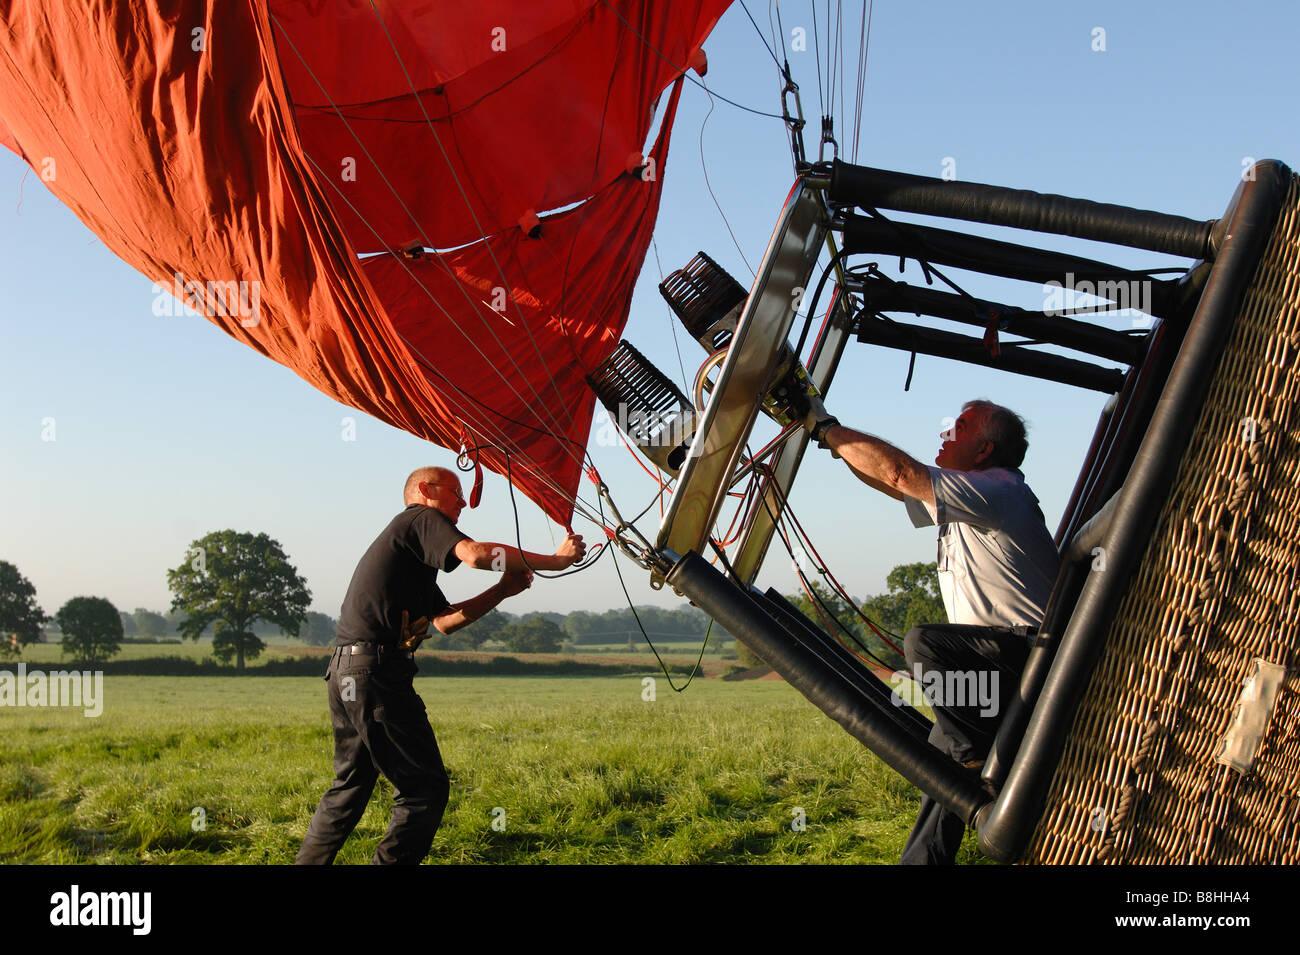 A hot air balloon prepairig for a flight - Stock Image